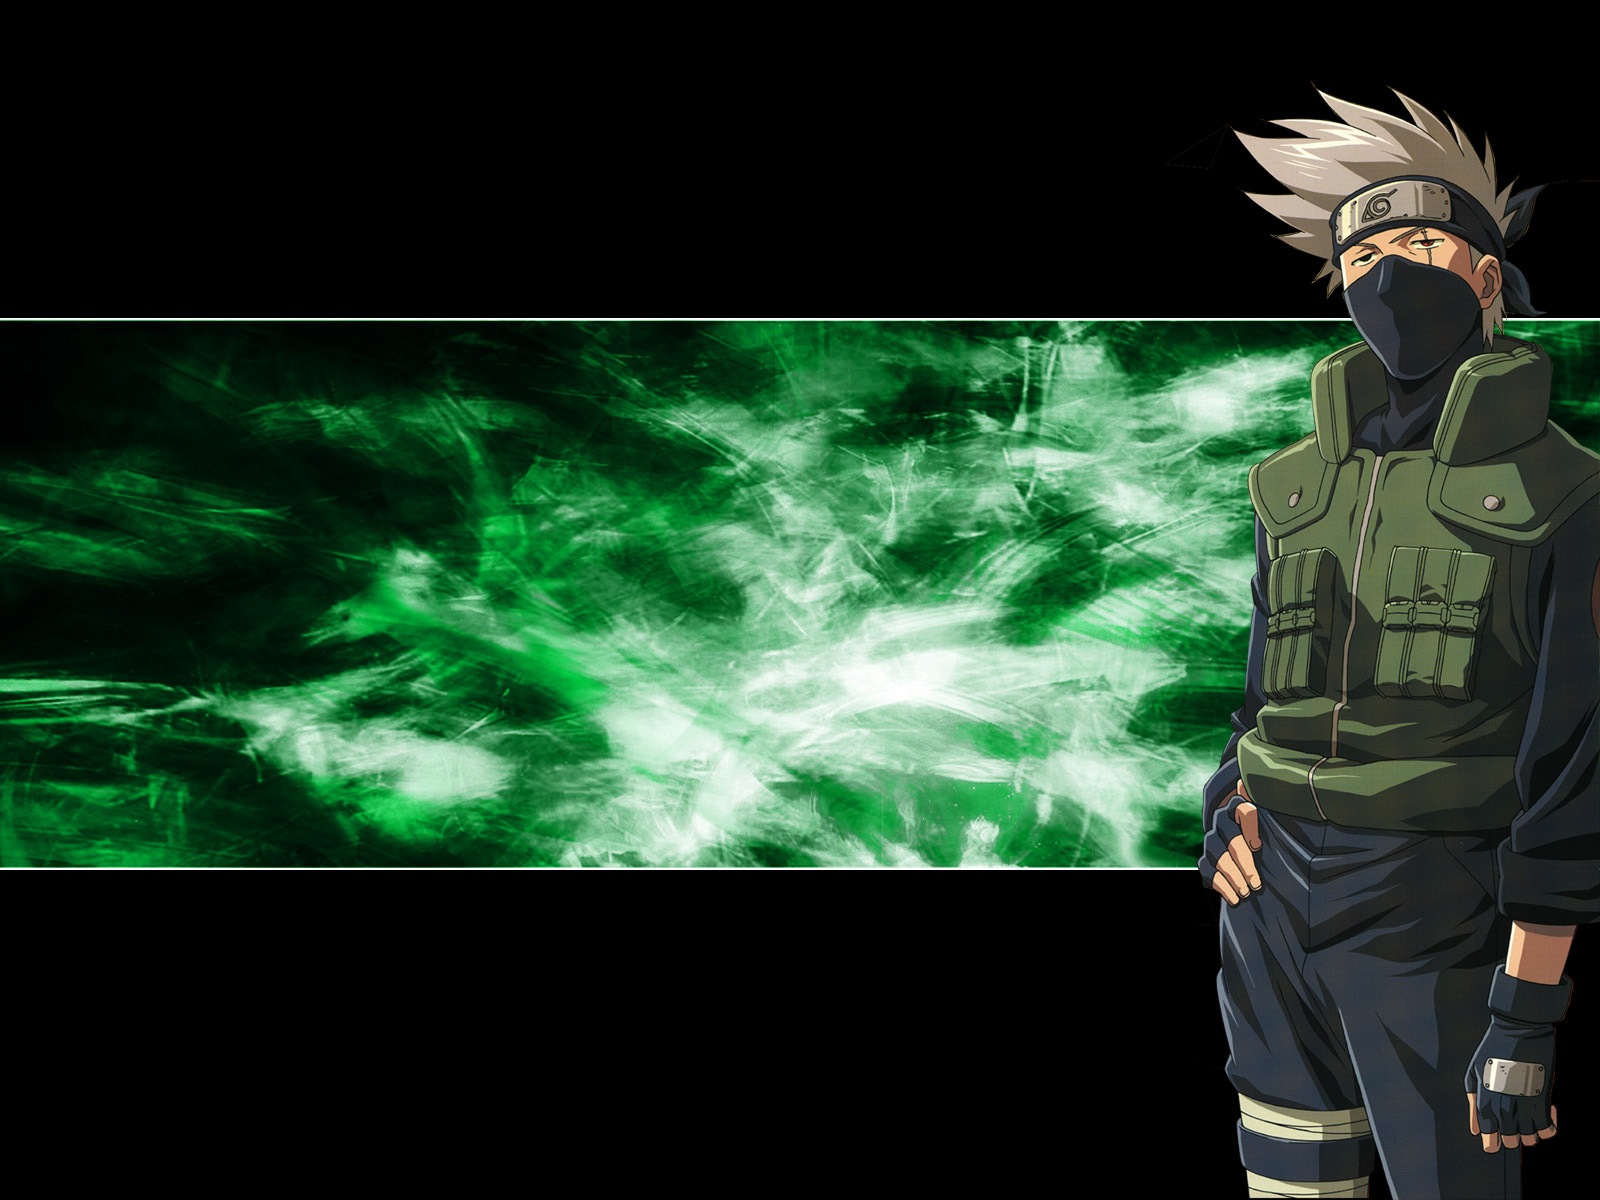 Kakashi wallpaper by Kakashi fansjpg 1600x1200